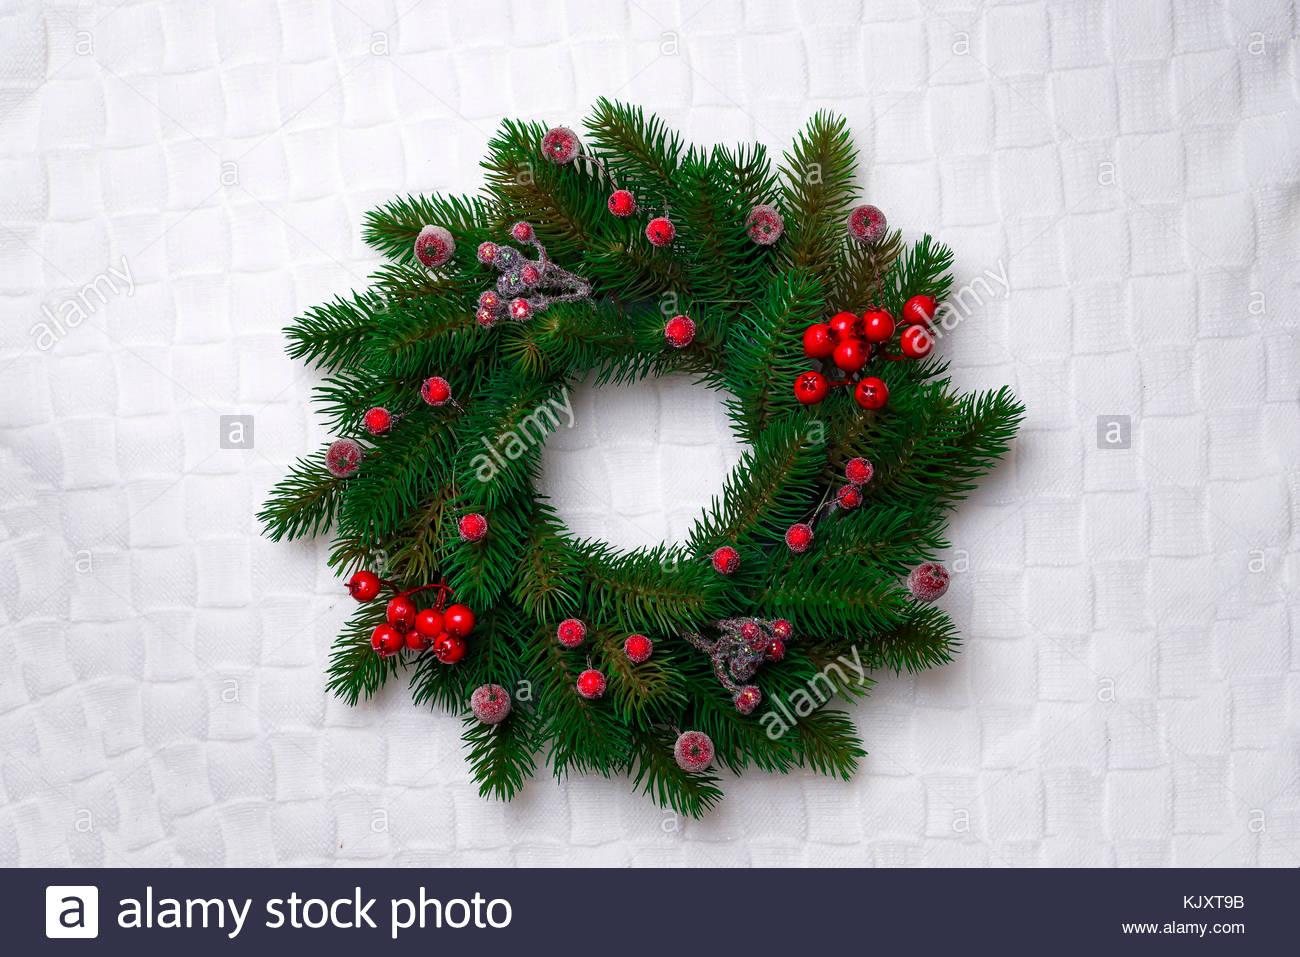 wreath hanging stockfotos wreath hanging bilder seite. Black Bedroom Furniture Sets. Home Design Ideas